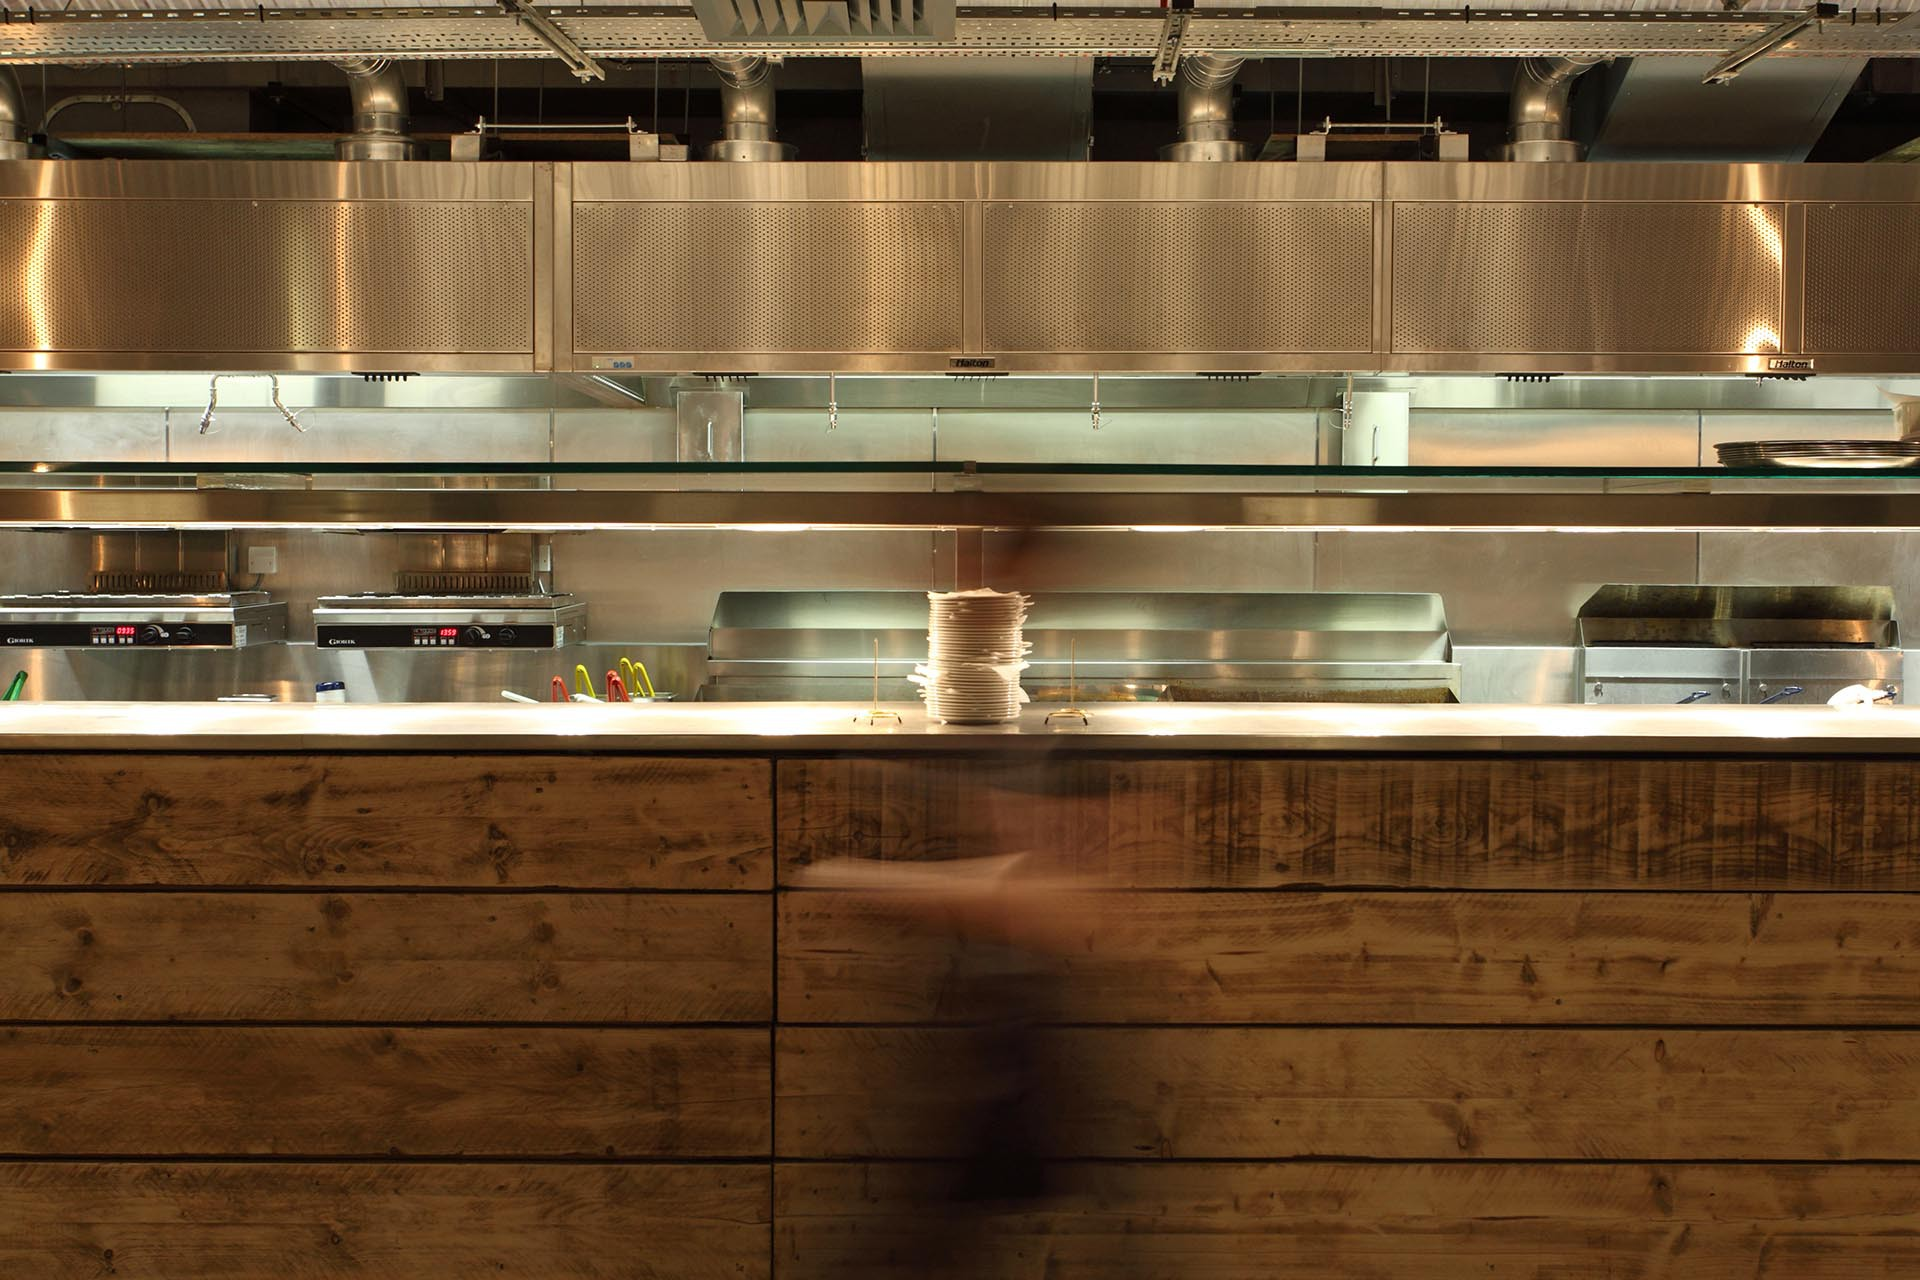 IMG_3576 kitchen counter